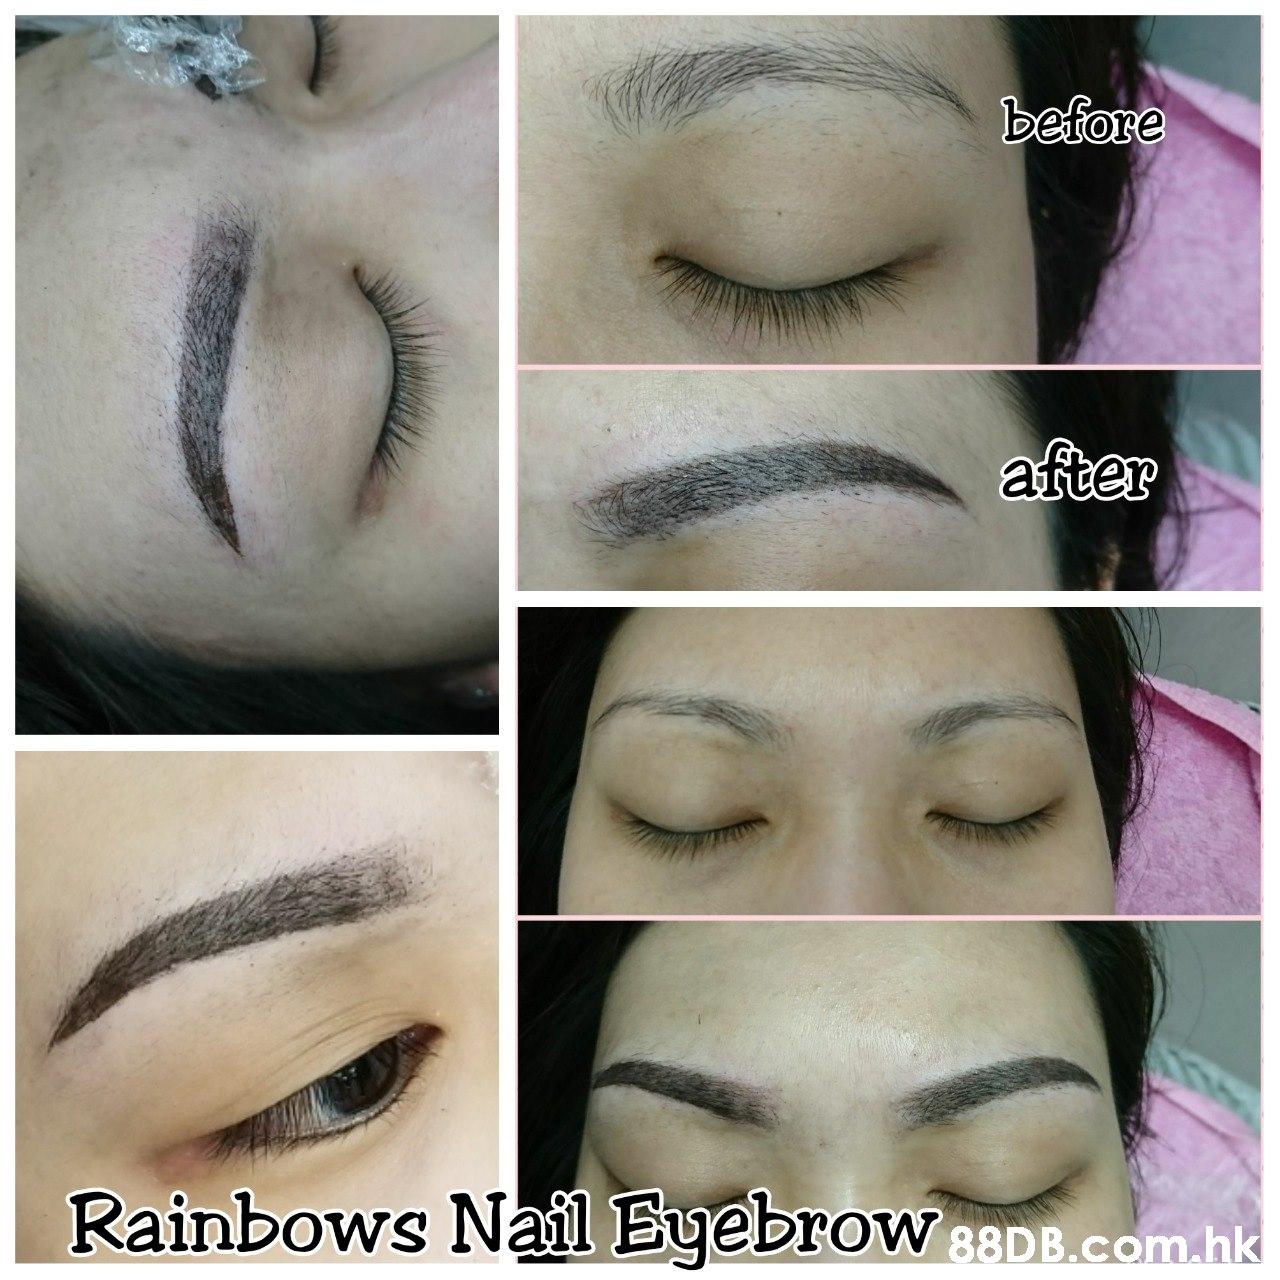 betore Rainbows Nail Eyebrow DrOW 88D B.com.hk  Eyebrow,Face,Skin,Eyelash,Eye